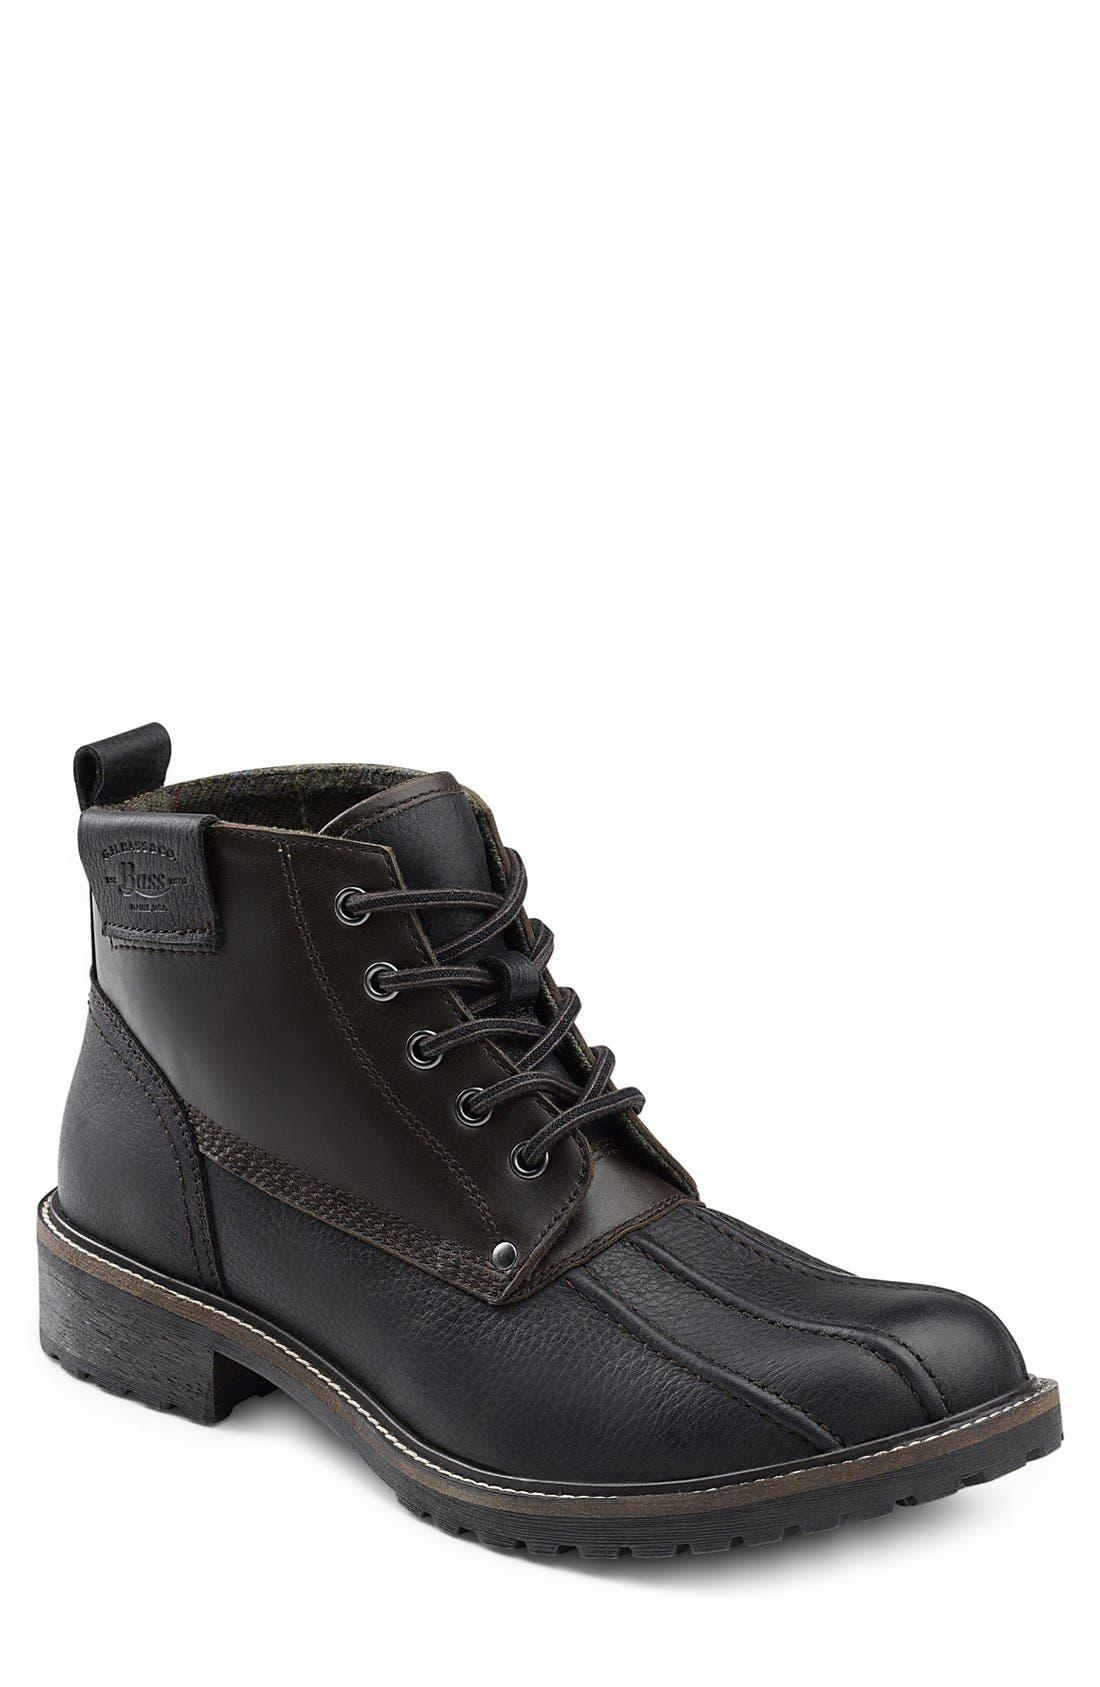 'Brigg' Plain Toe Boot,                         Main,                         color, 200